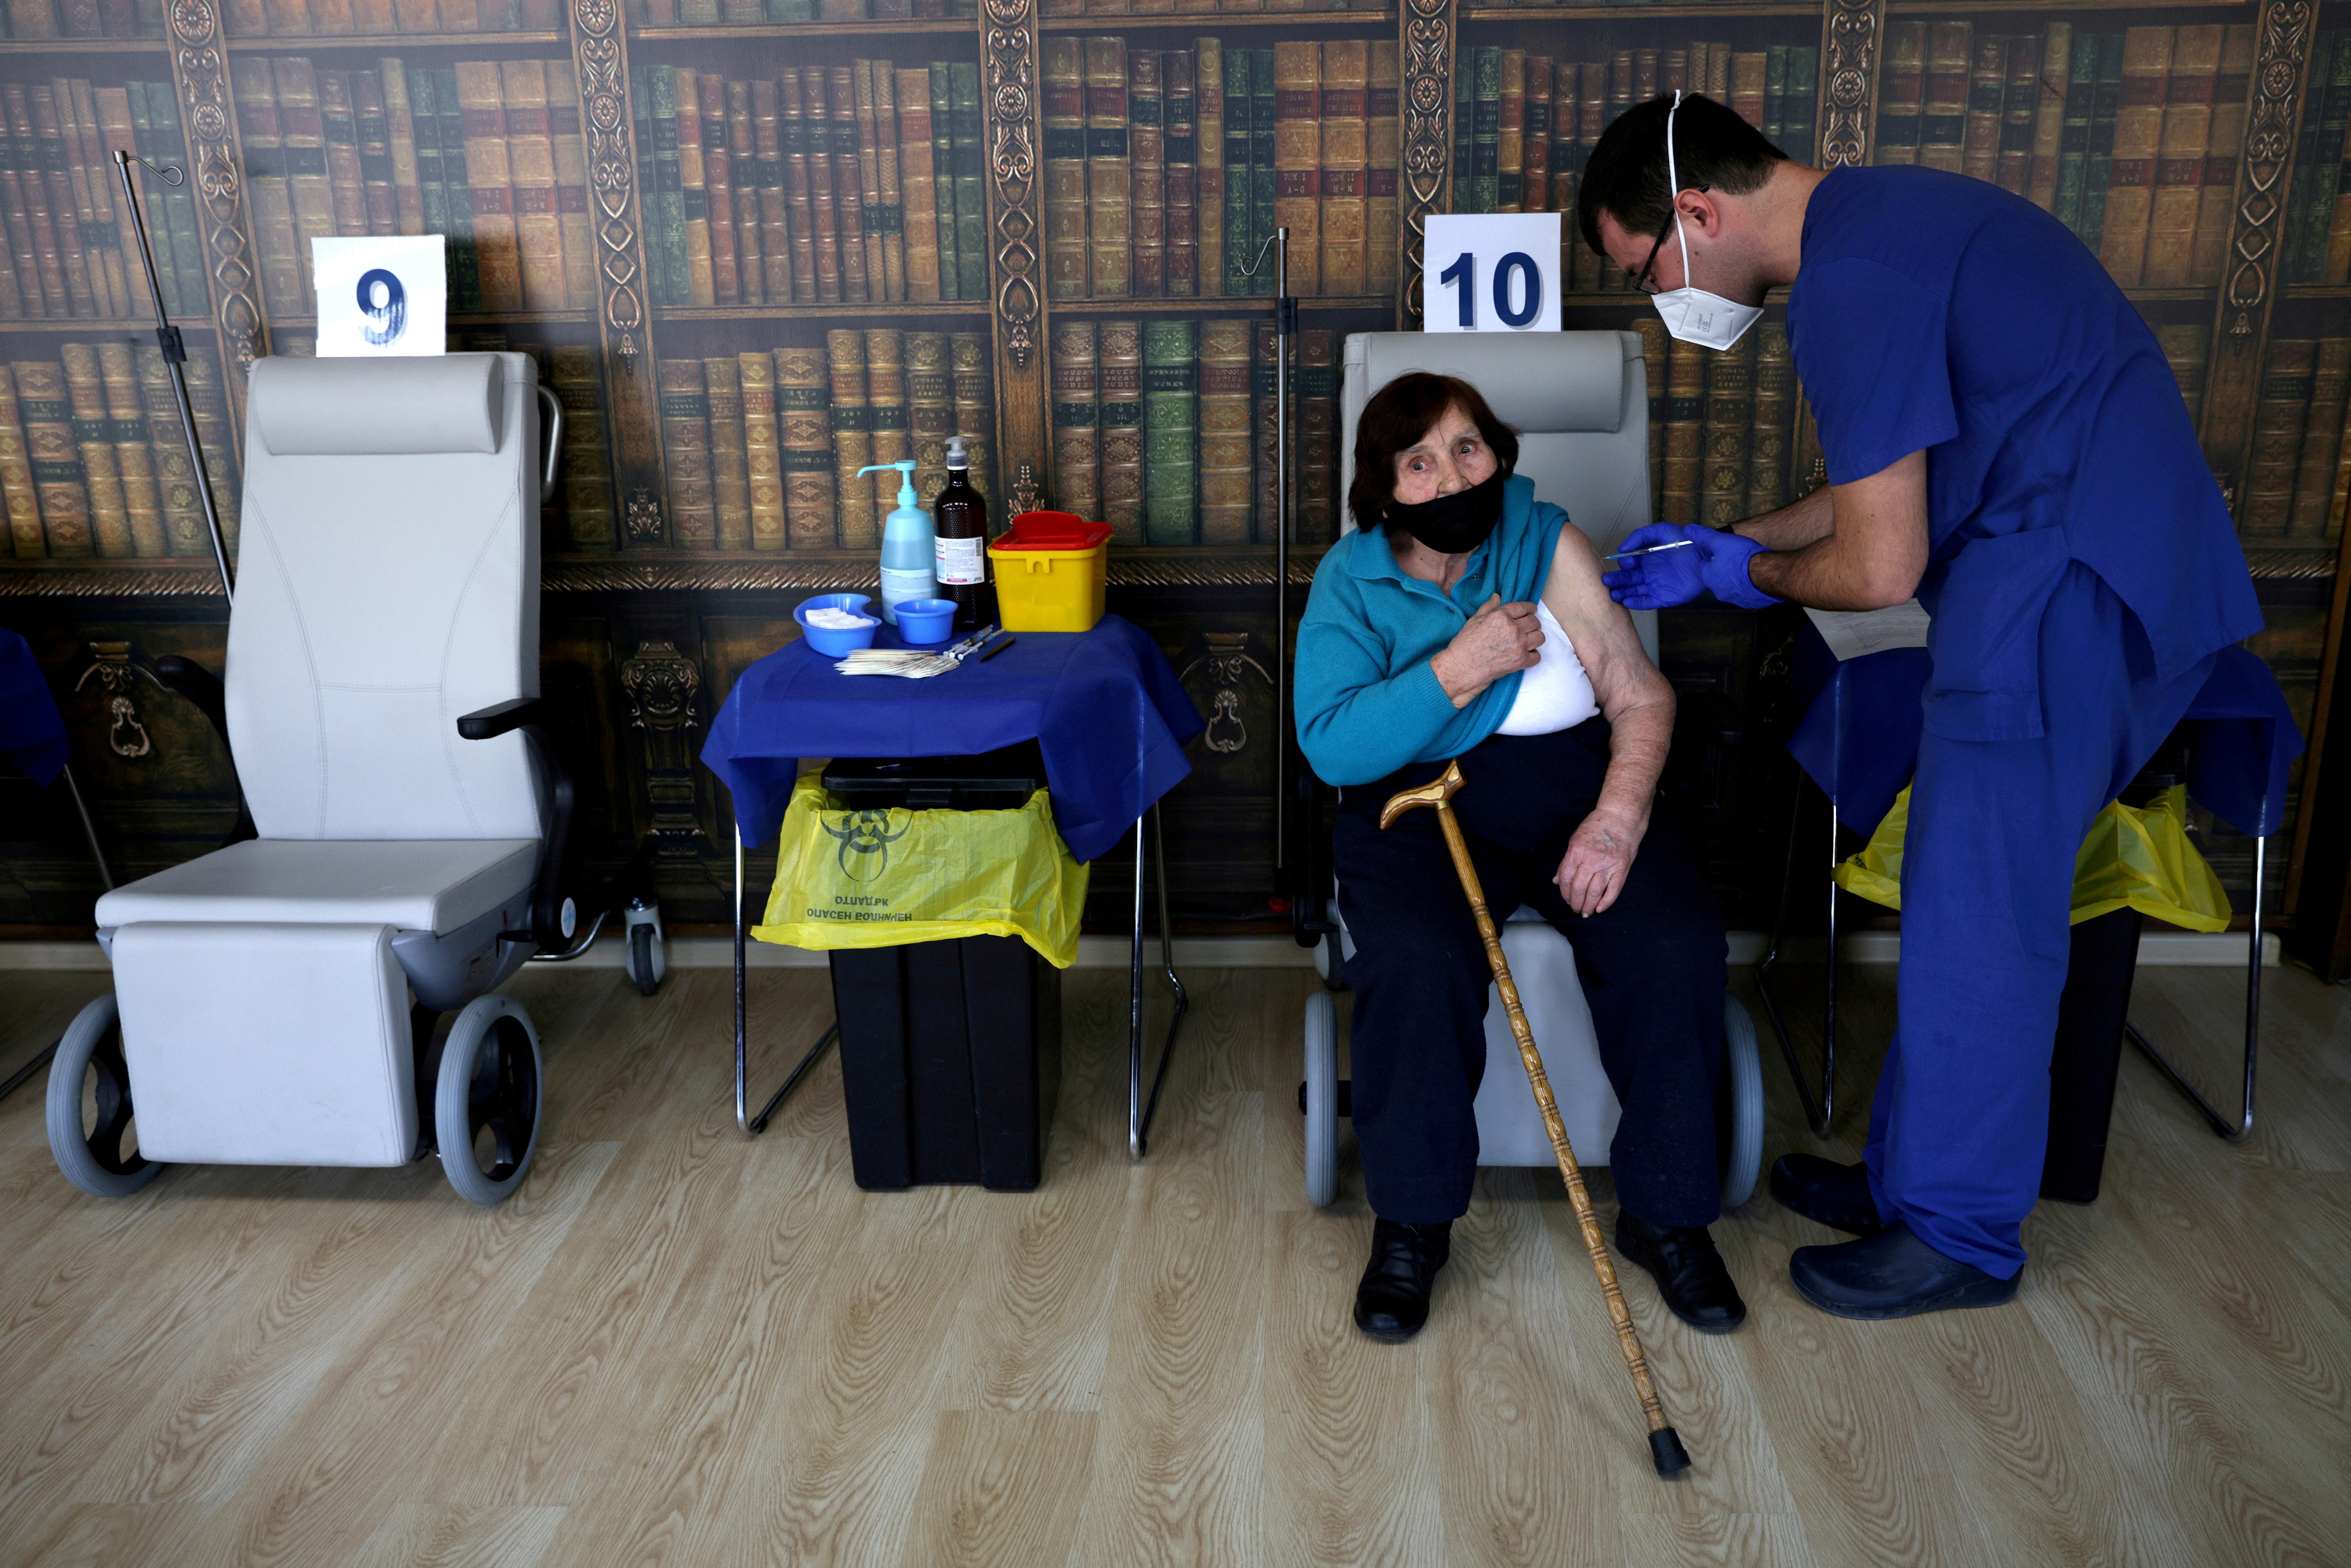 Lala Staribratova, 95, a World War II veteran receives a coronavirus disease (COVID-19) vaccine at the Military Medical Academy in Sofia, Bulgaria, February 23, 2021. REUTERS/Stoyan Nenov//File Photo